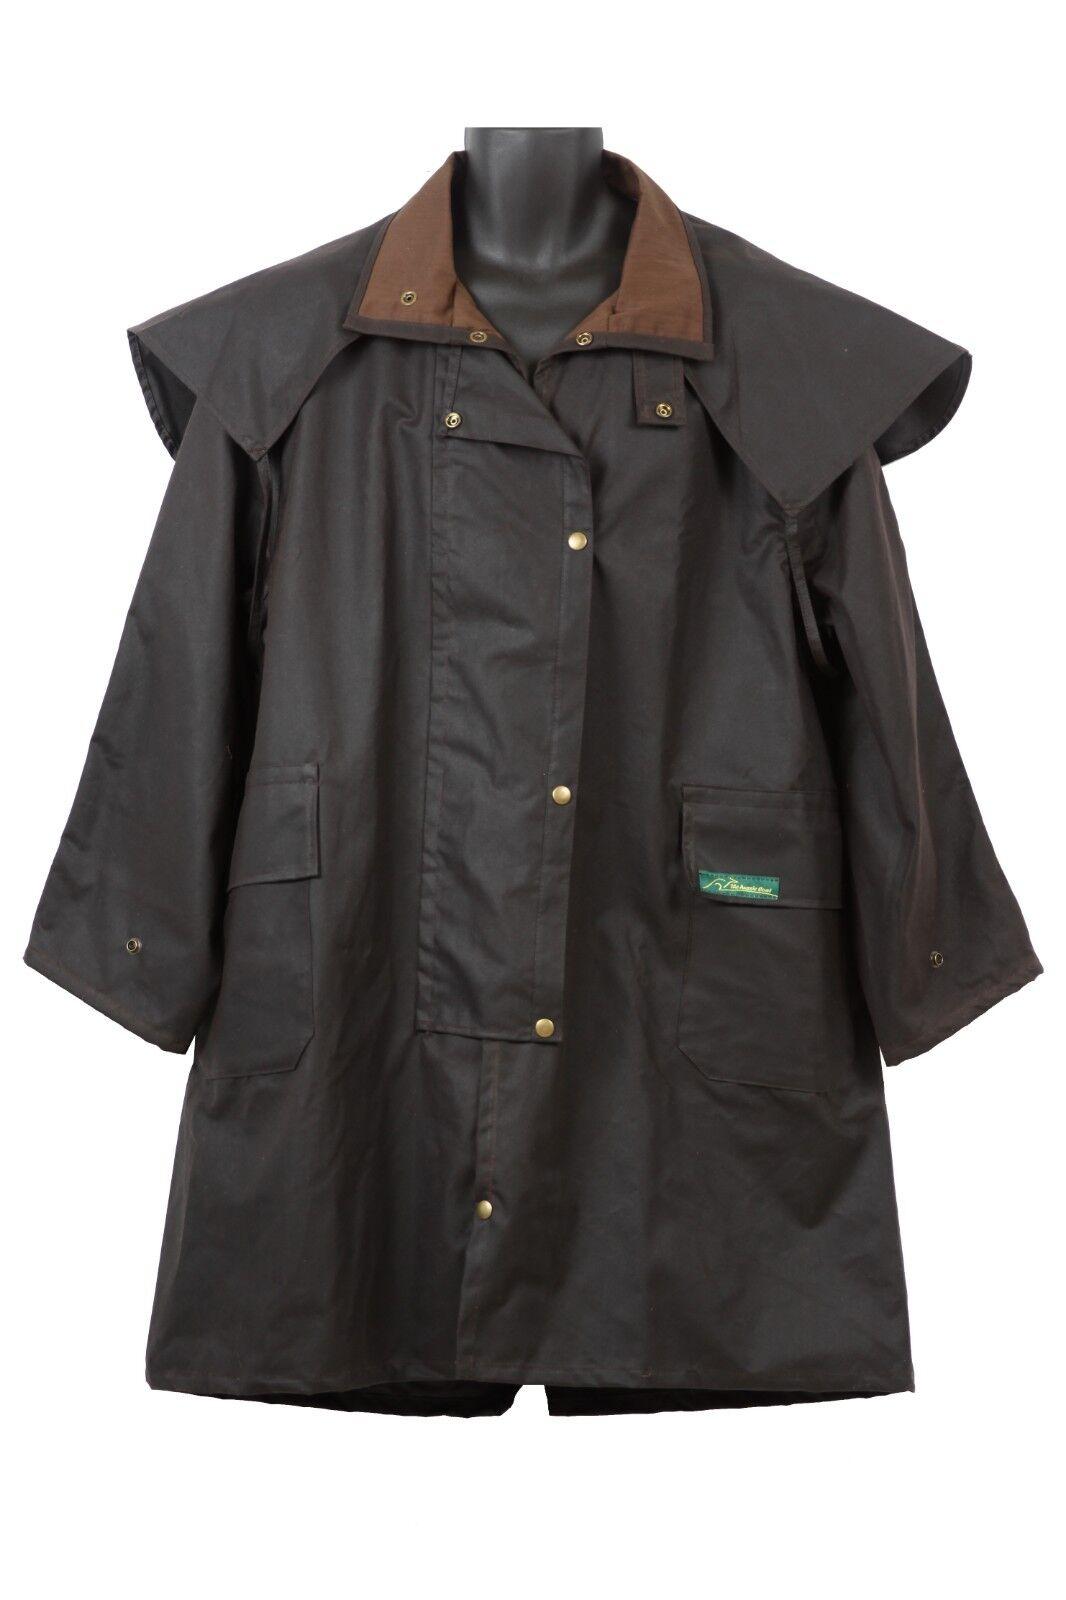 Australian Made Oilskin Coat Dimensiones 3XS to 8XL knee length